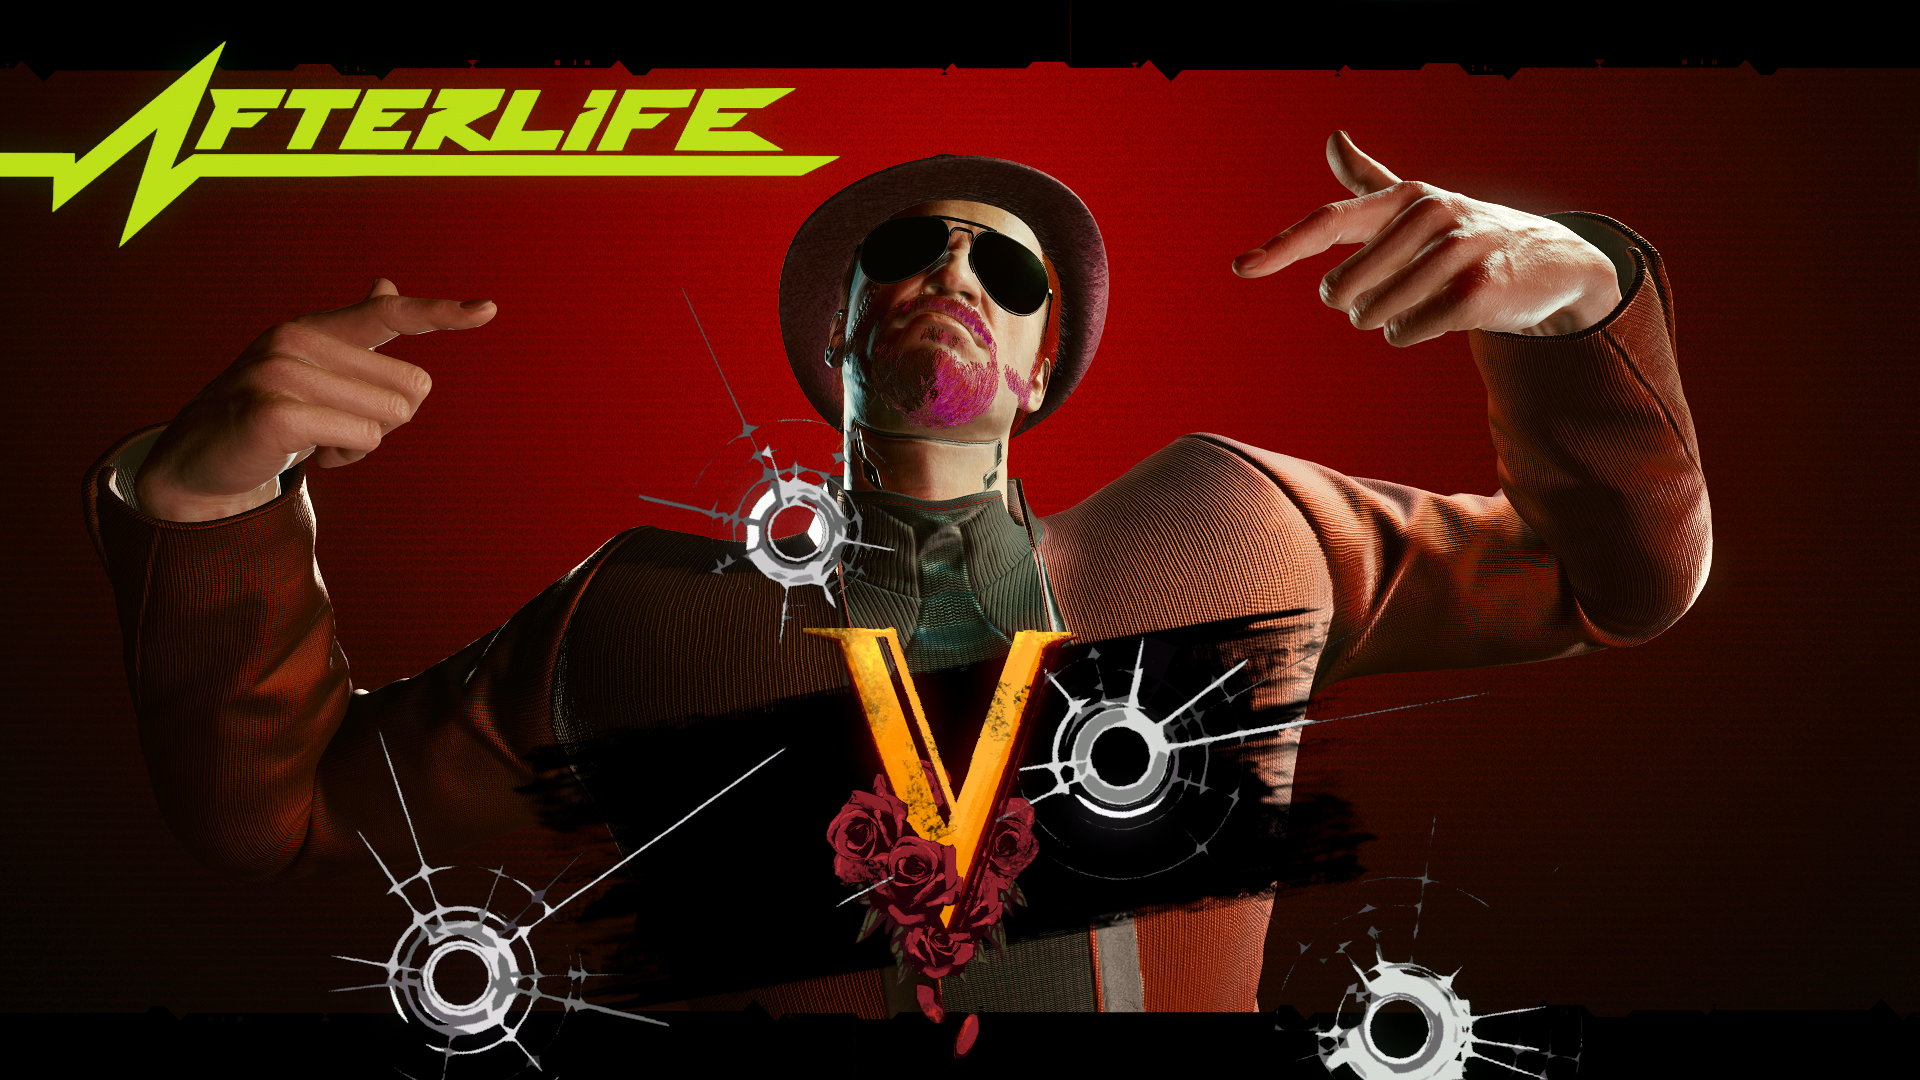 Cyberpunk 2077 (C) 2020 by CD Projekt RED 2020-12-19 04_50_38.png